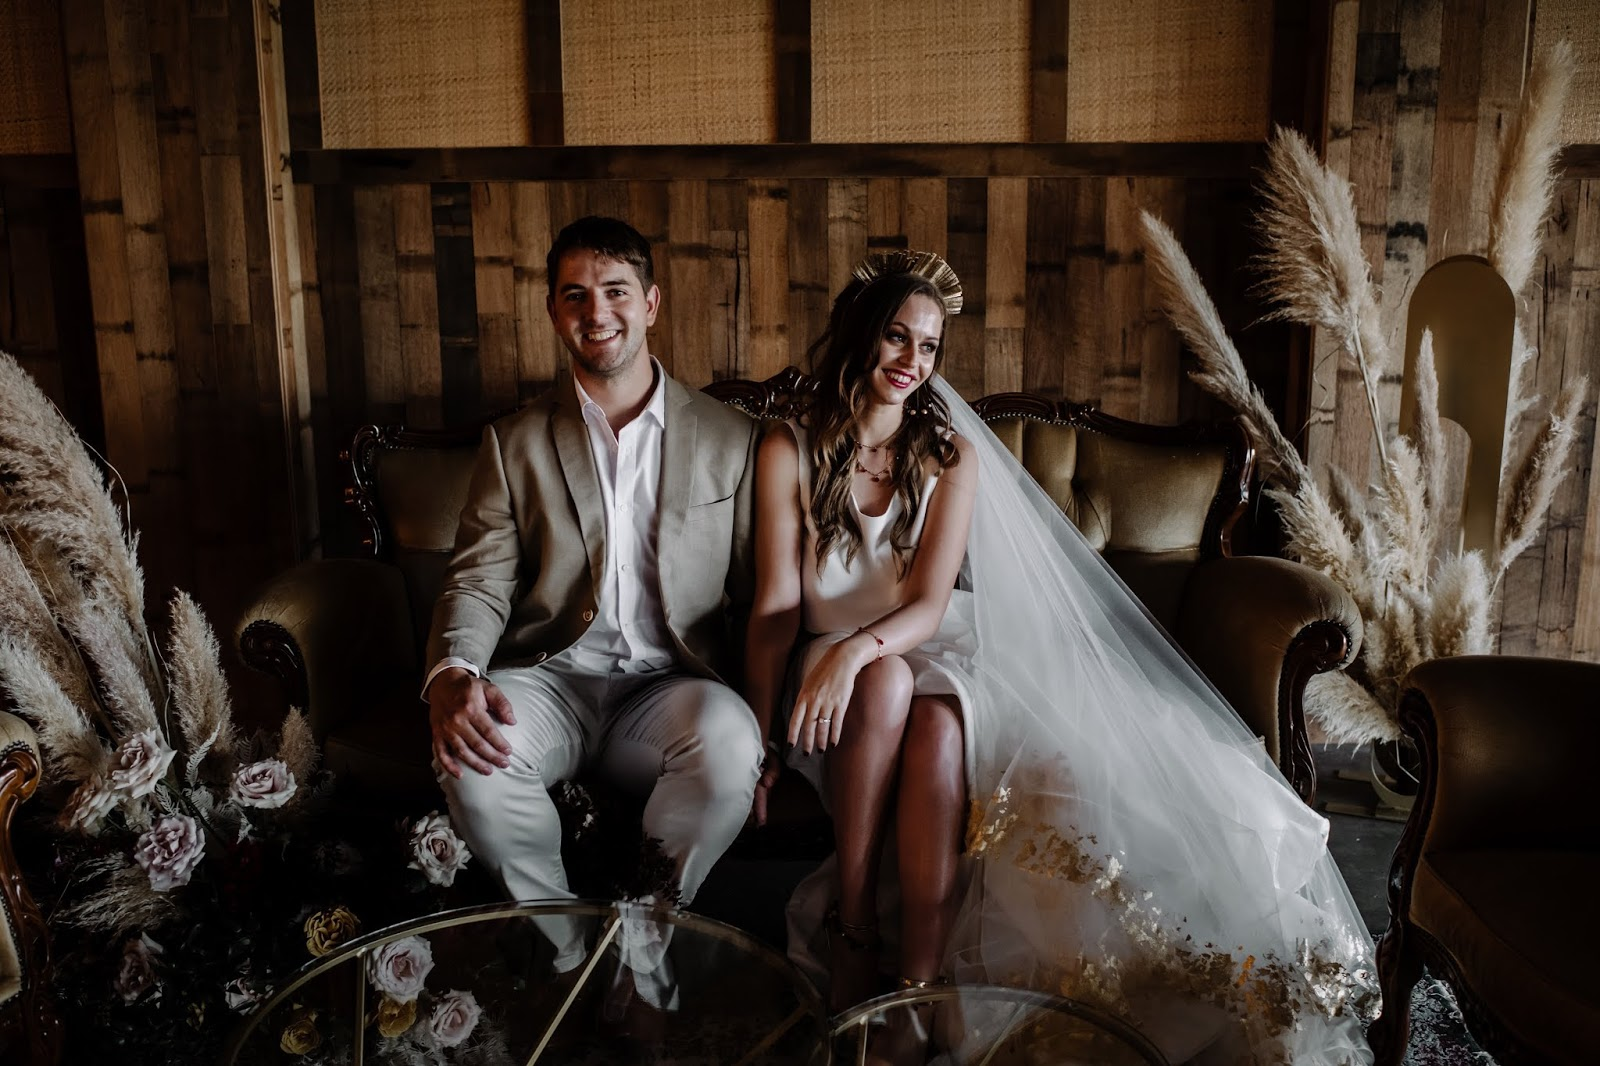 STYLED SHOOT: BOHEMIAN GLAM WEDDING INSPIRATION PERTH WA